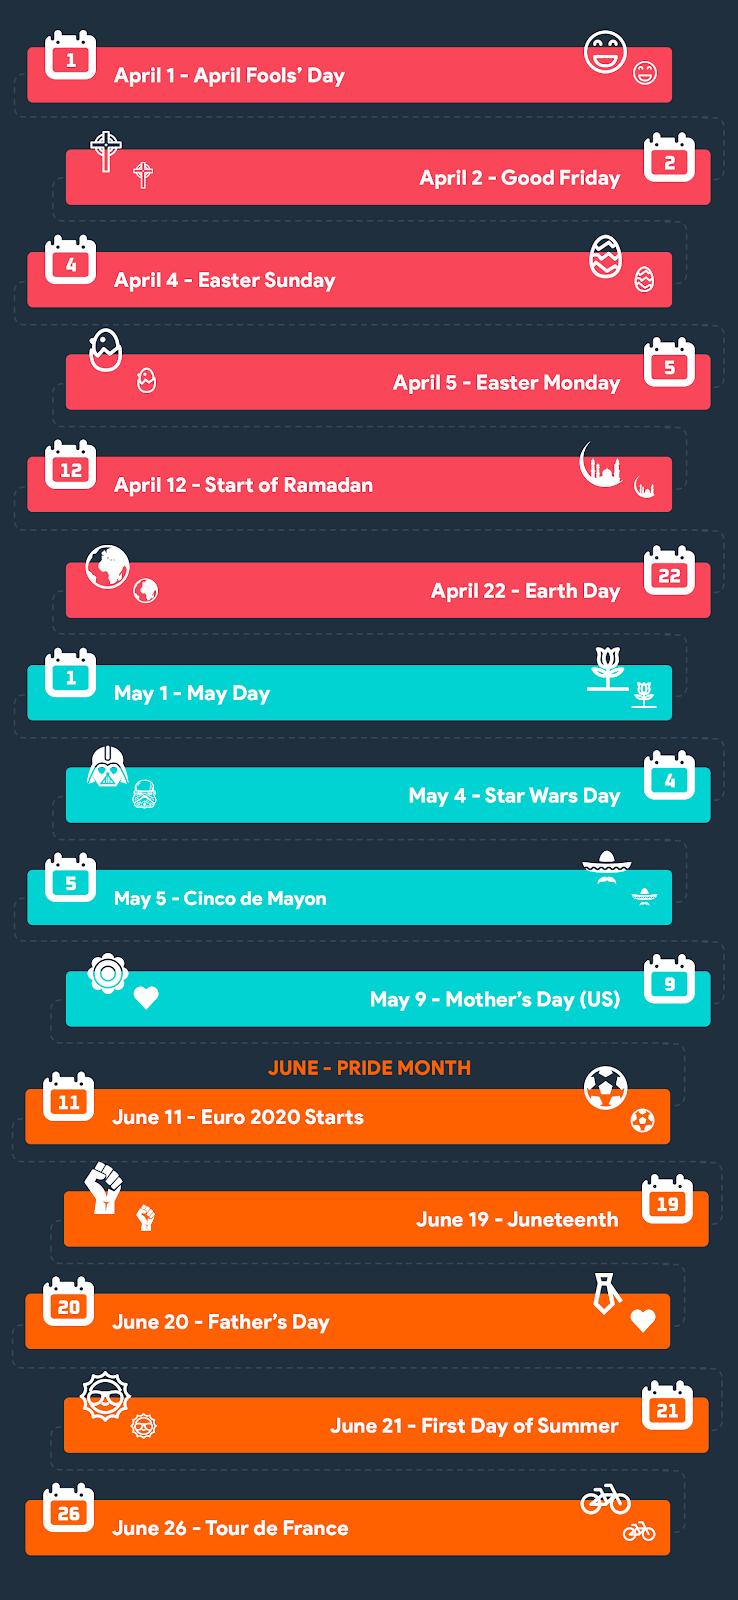 Key dates in 2021 - Affiliate marketing calendar(Q2: APRIL - JUNE)